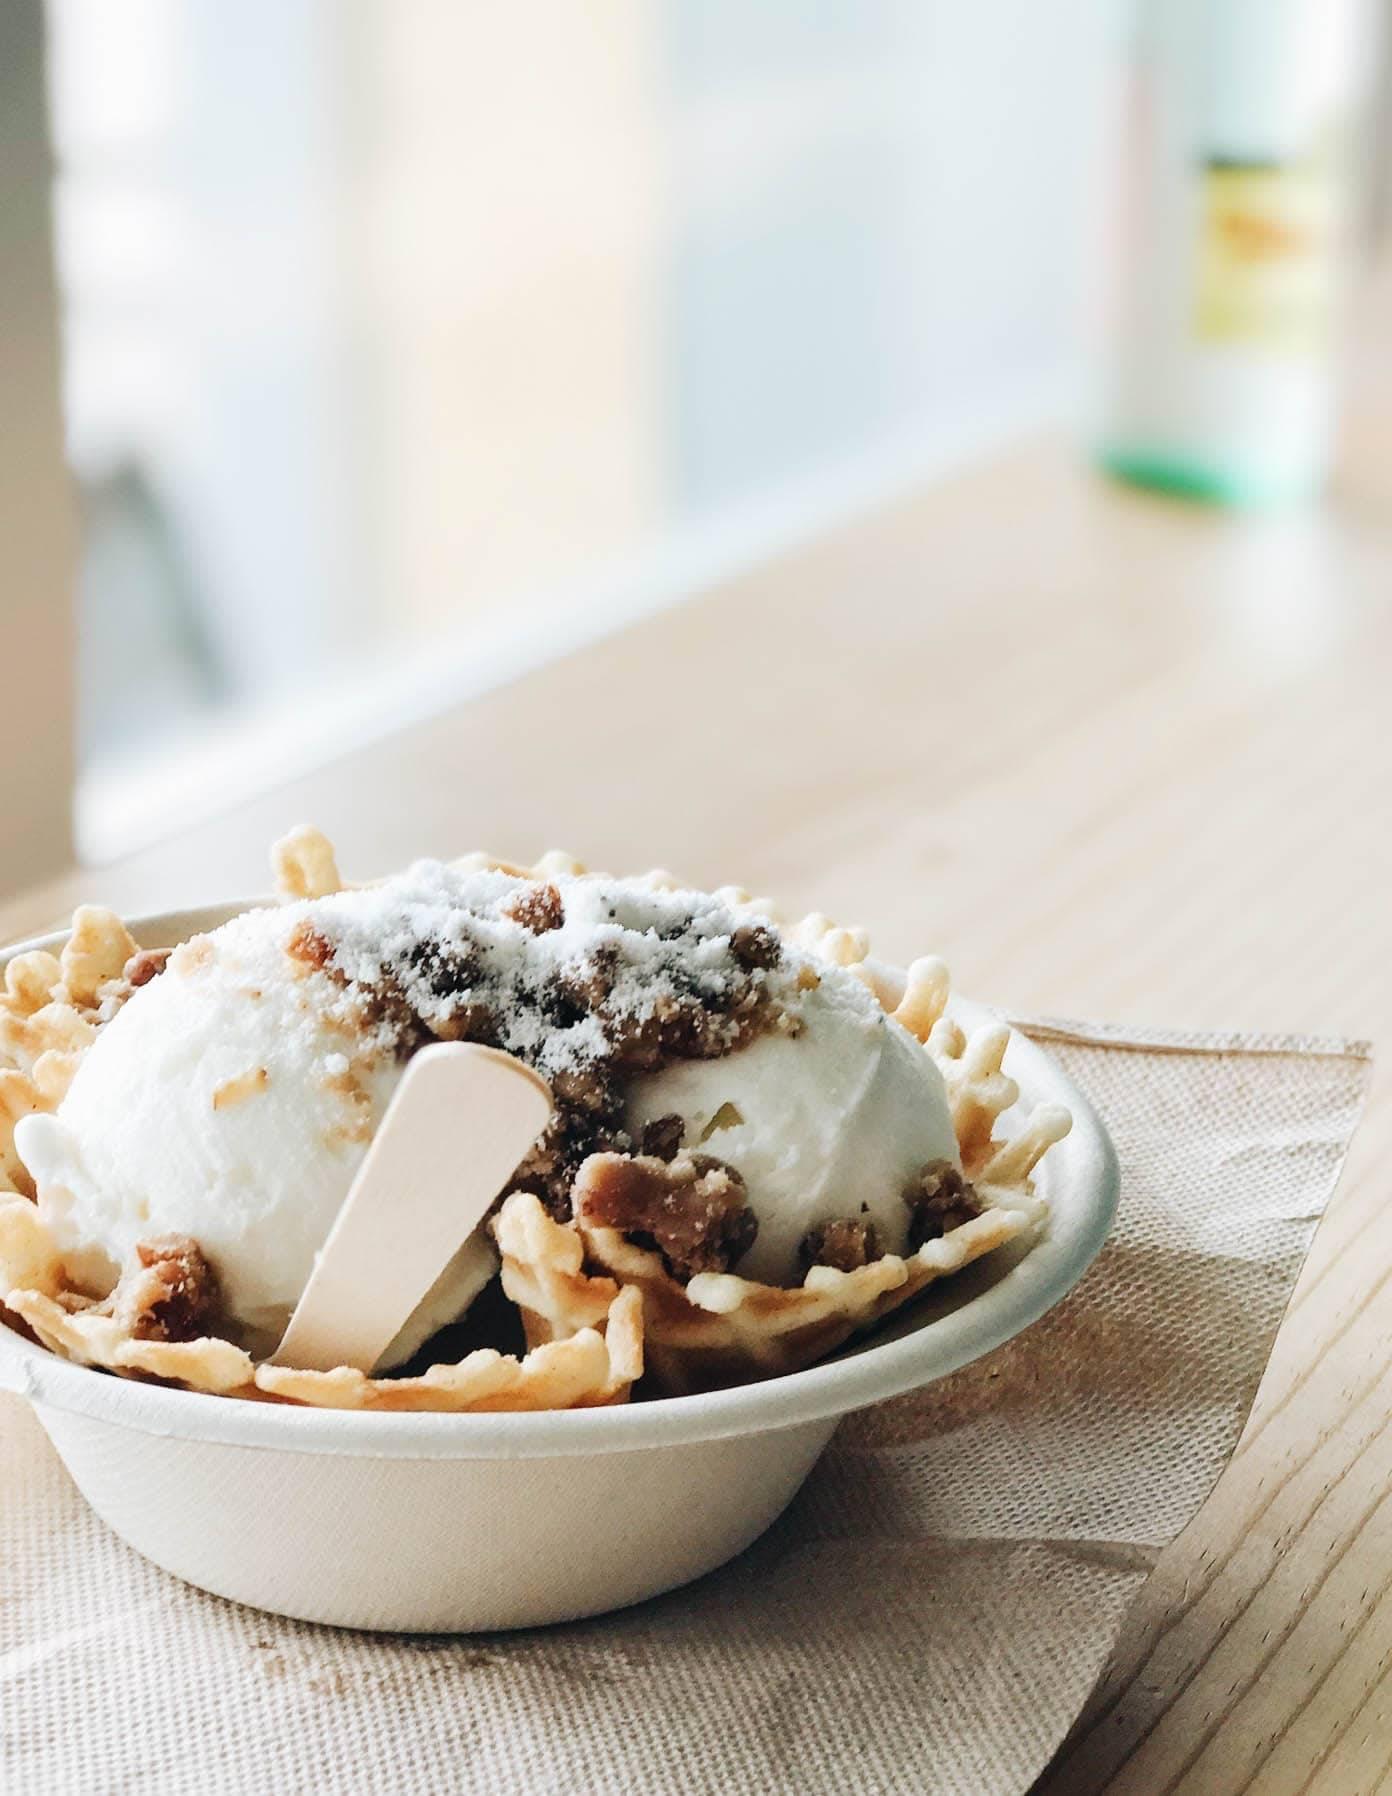 Ice cream in a bowl.